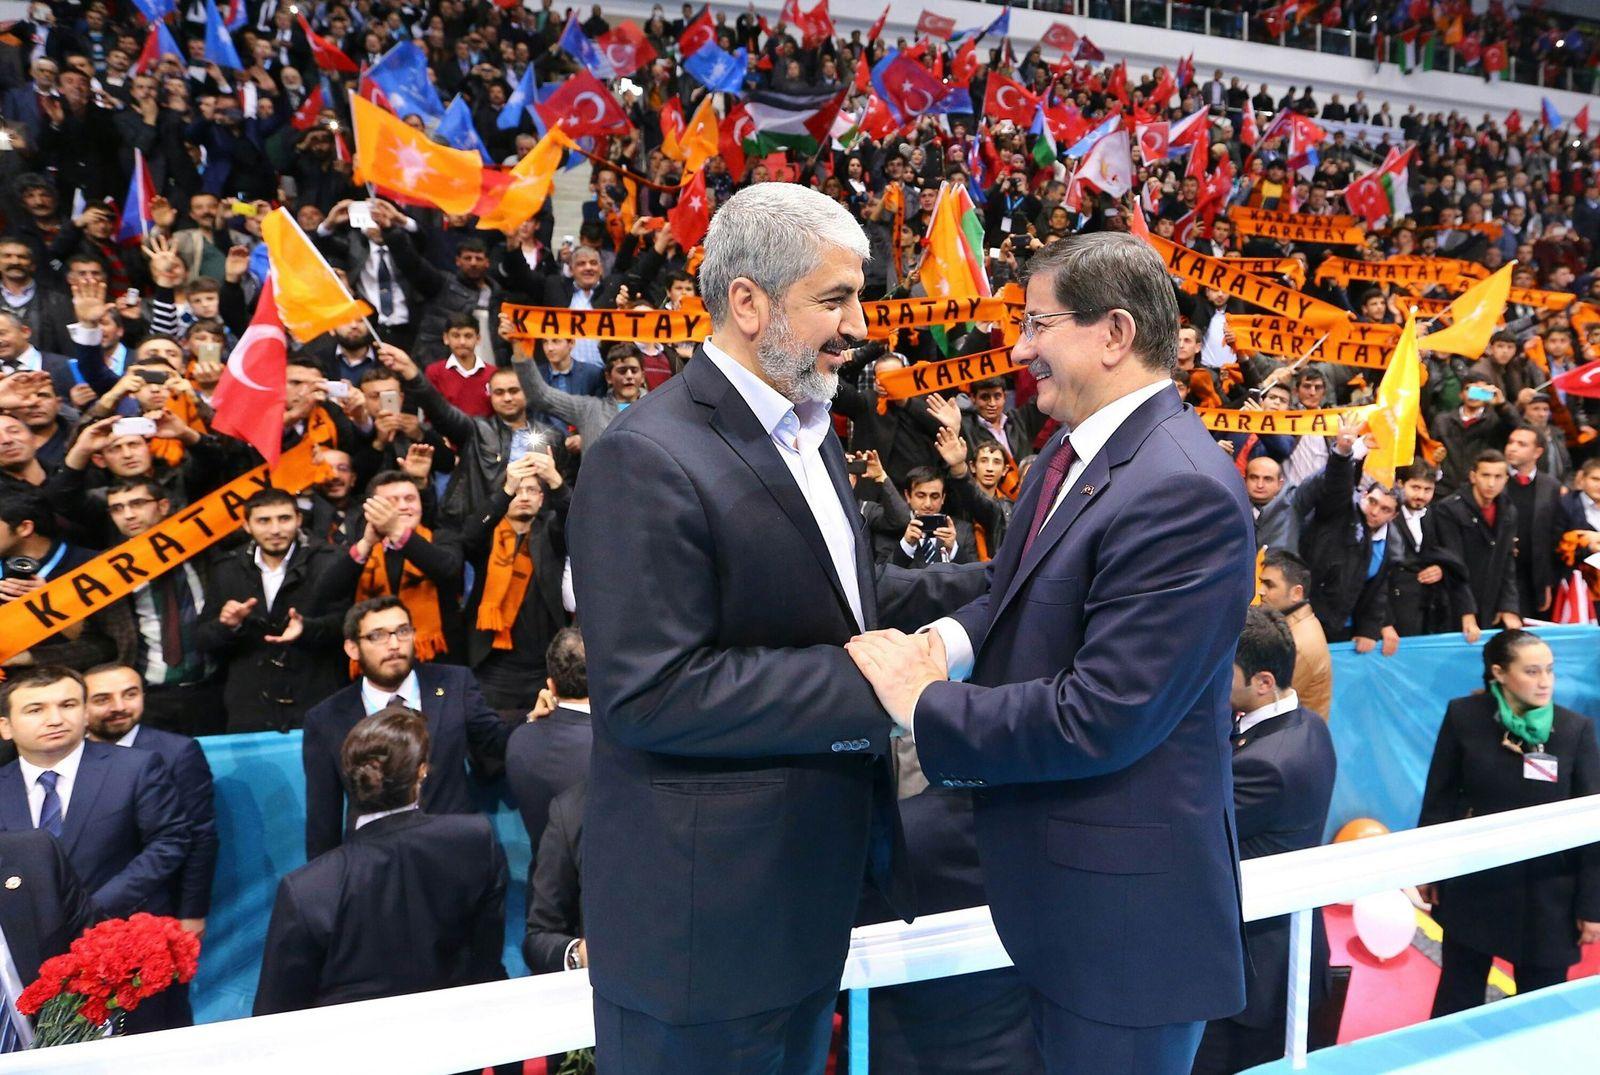 AKP-Kongress: Hamas-Chef Mashal bei Ahmet Davutoglu